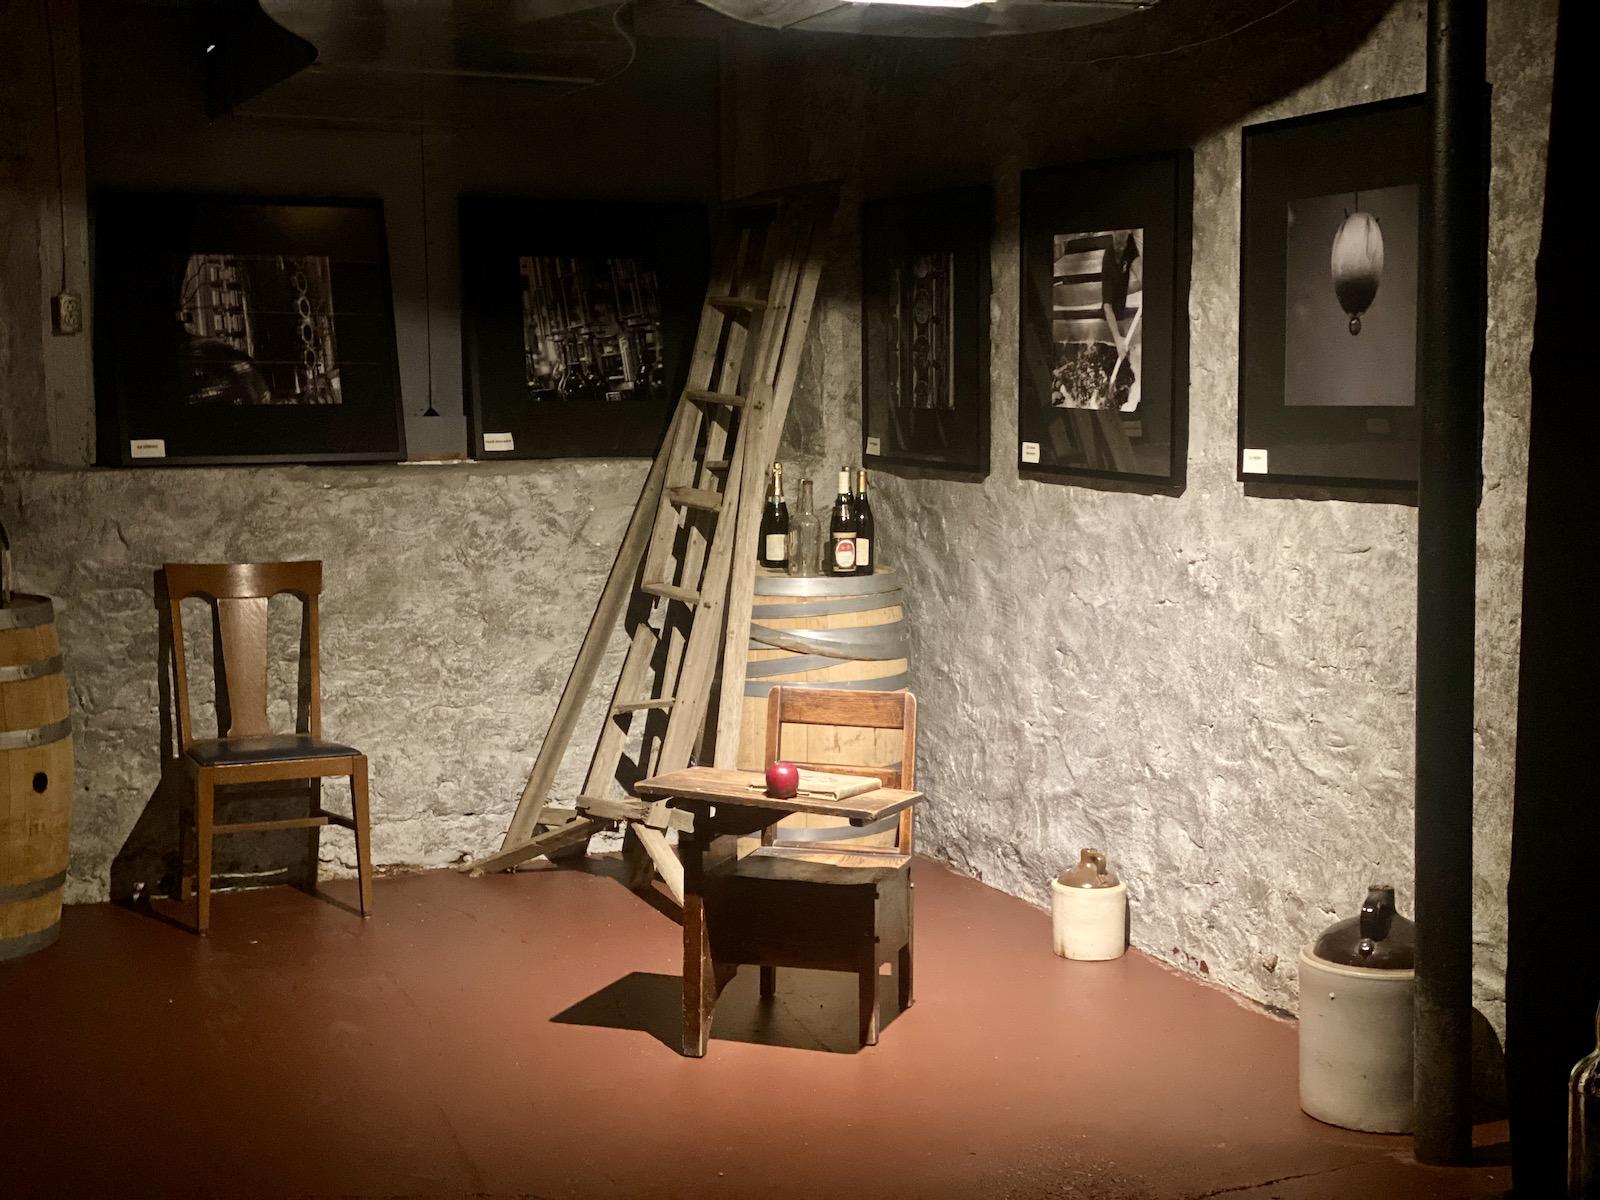 Desk in basement of Penninsula Winery, a former schoolhouse